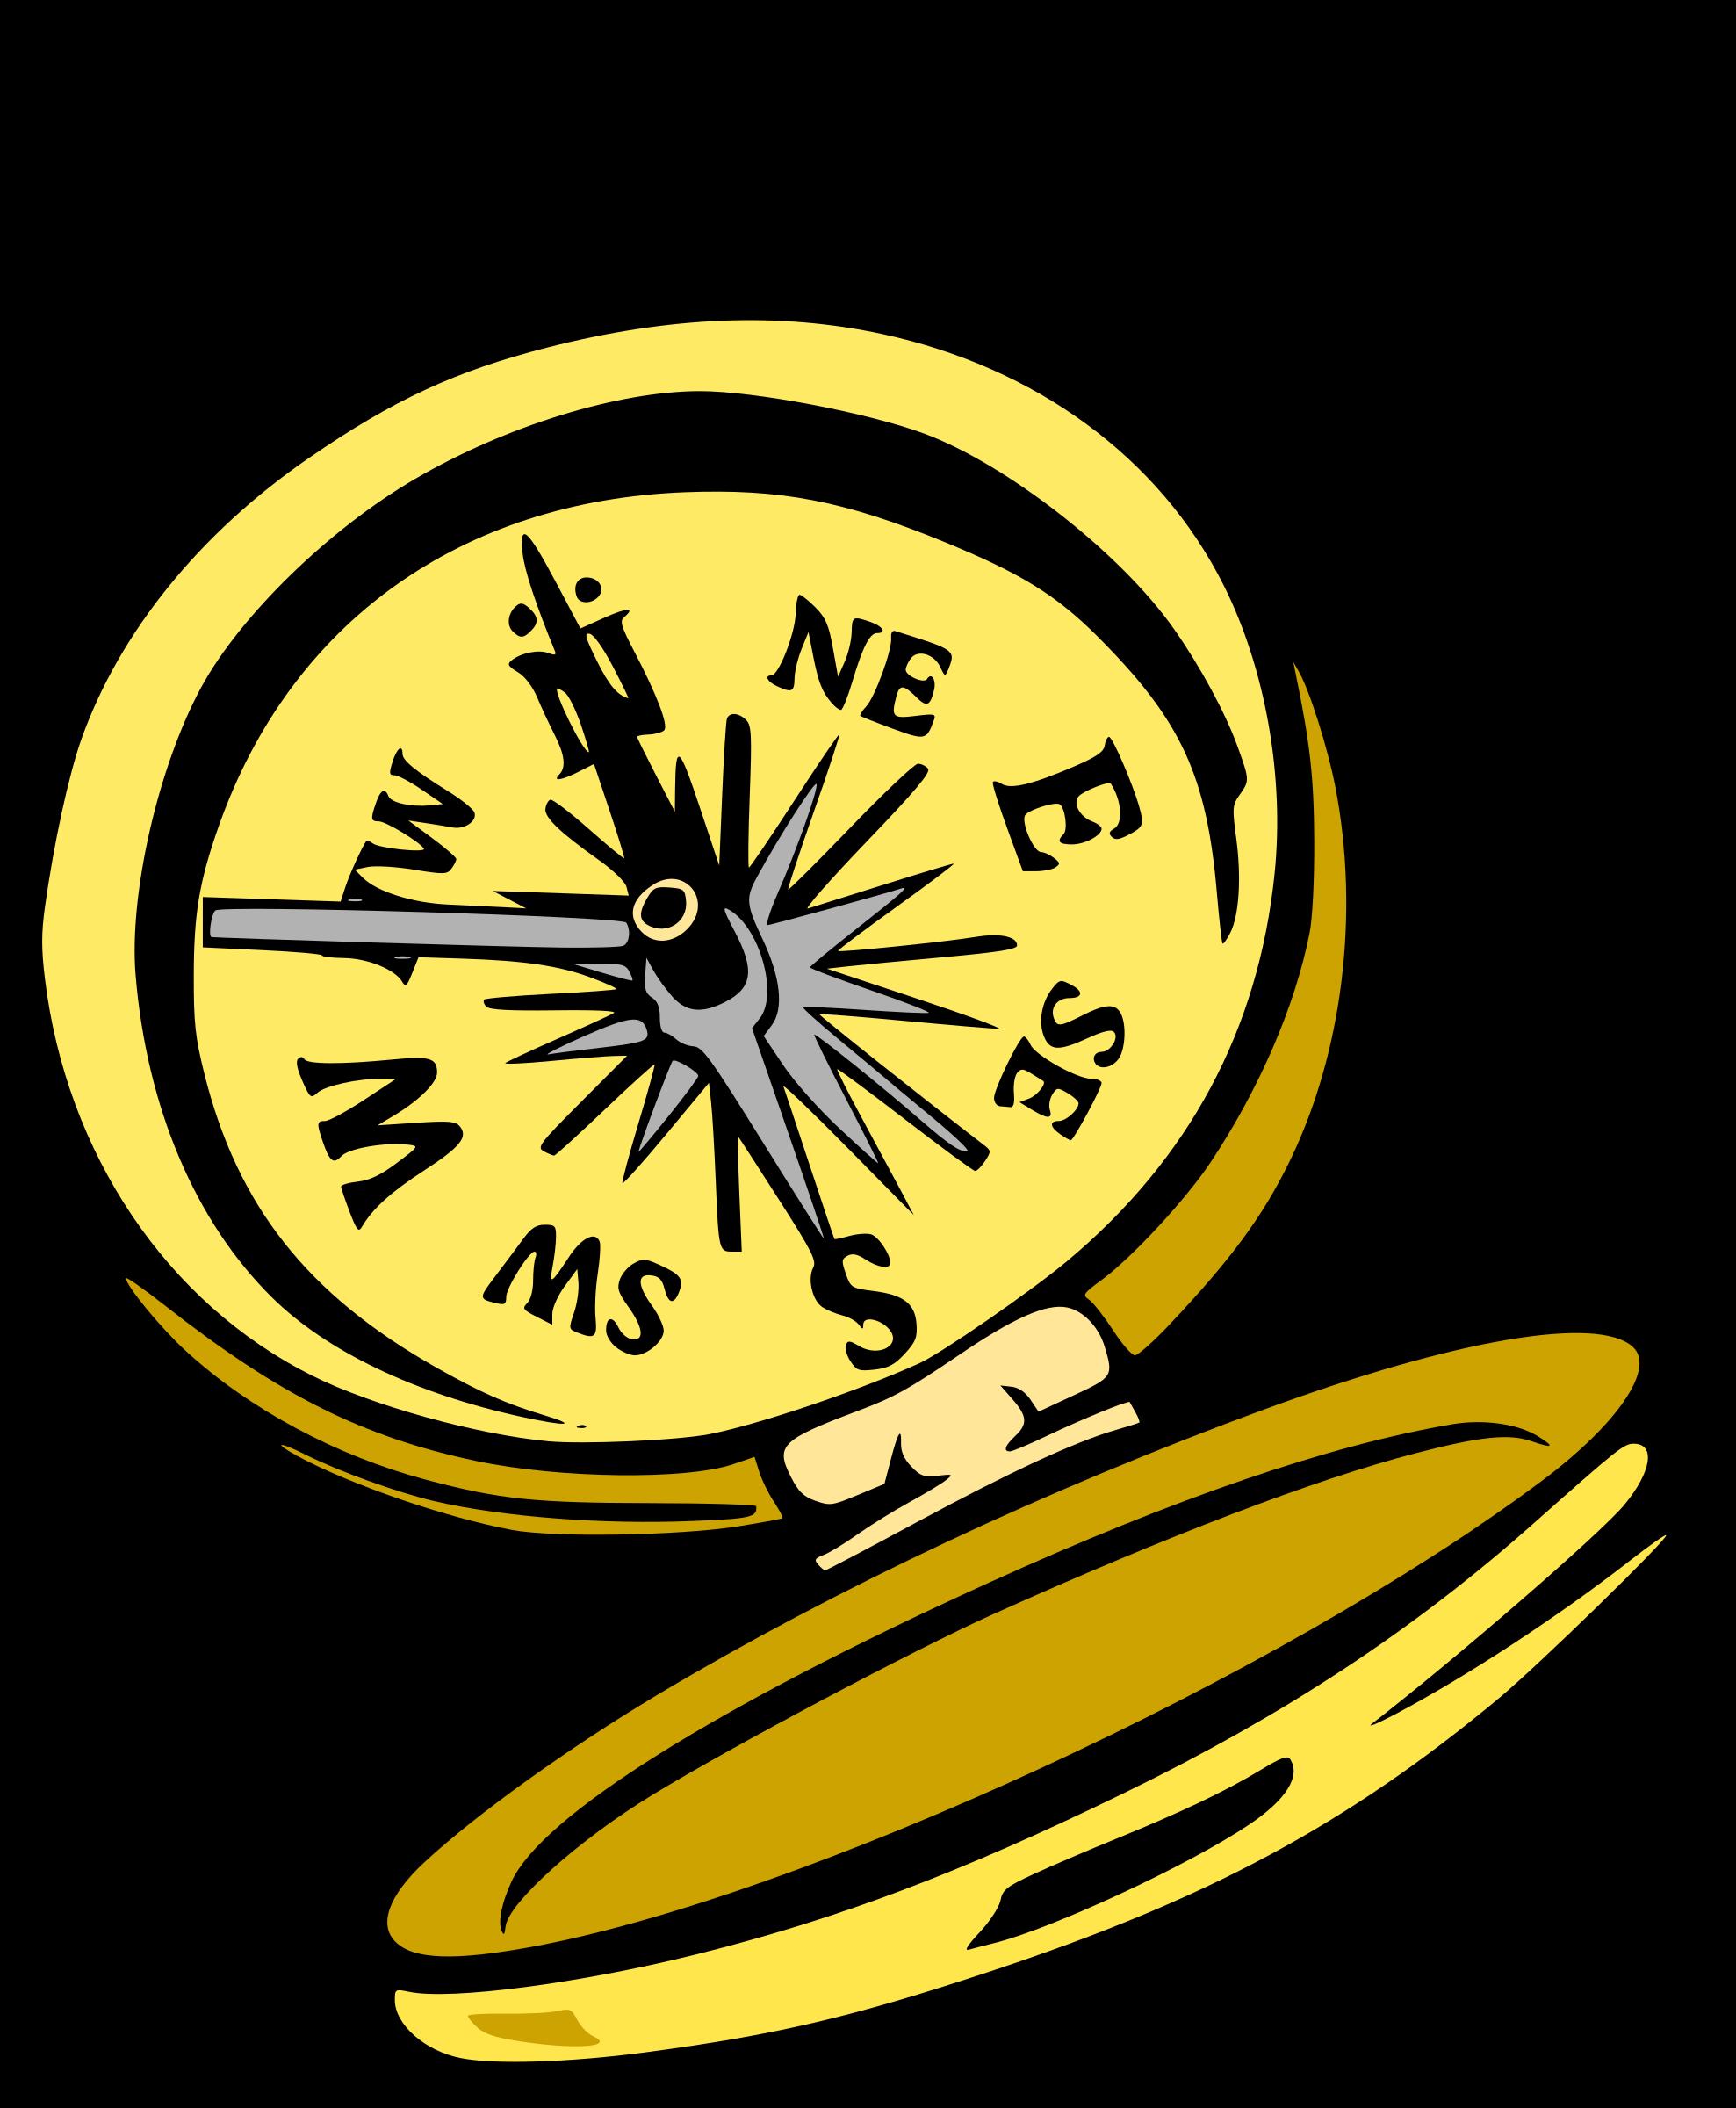 Pirates clipart tool. Compass big image png